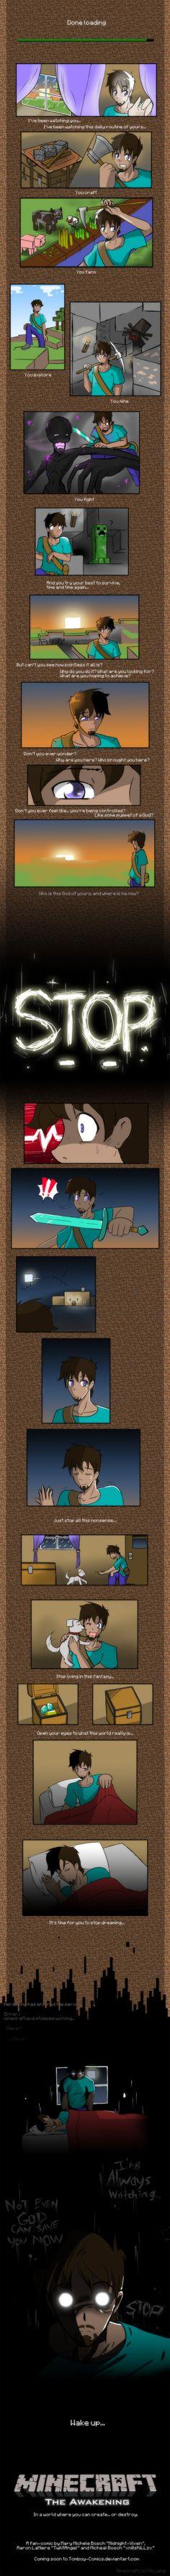 Minecraft Comic of the legend of HEROBRINE